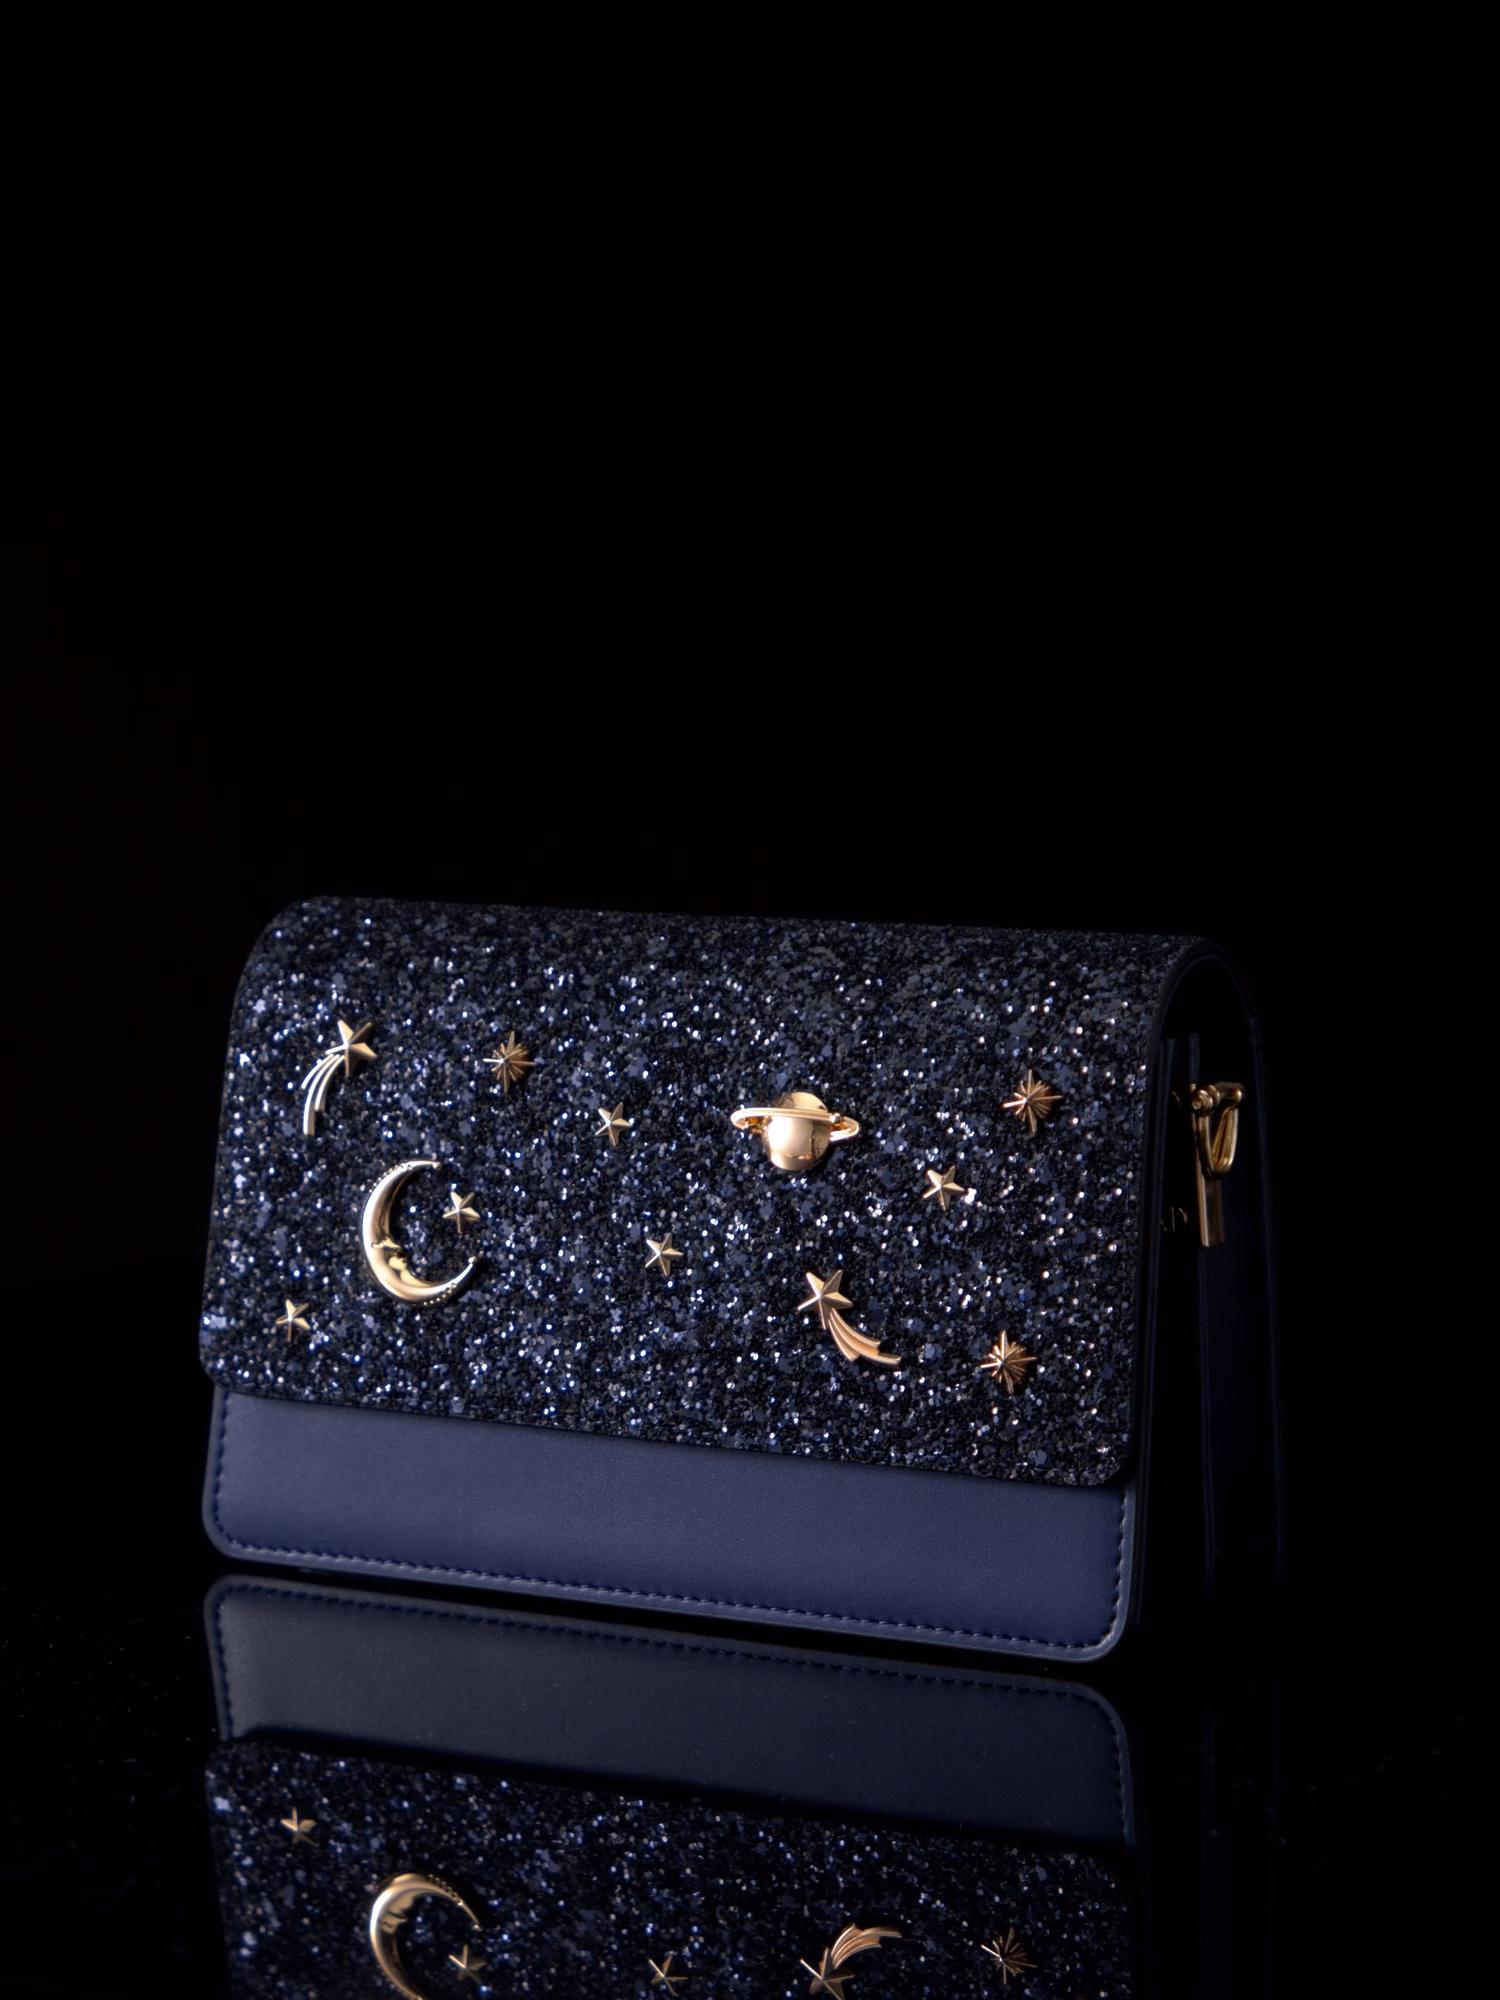 2020 New Sequin Bags Women Hand Bag Designers Luxury Handbags Women Shoulder Bags Female Top-handle Bags Fashion Brand Handbags